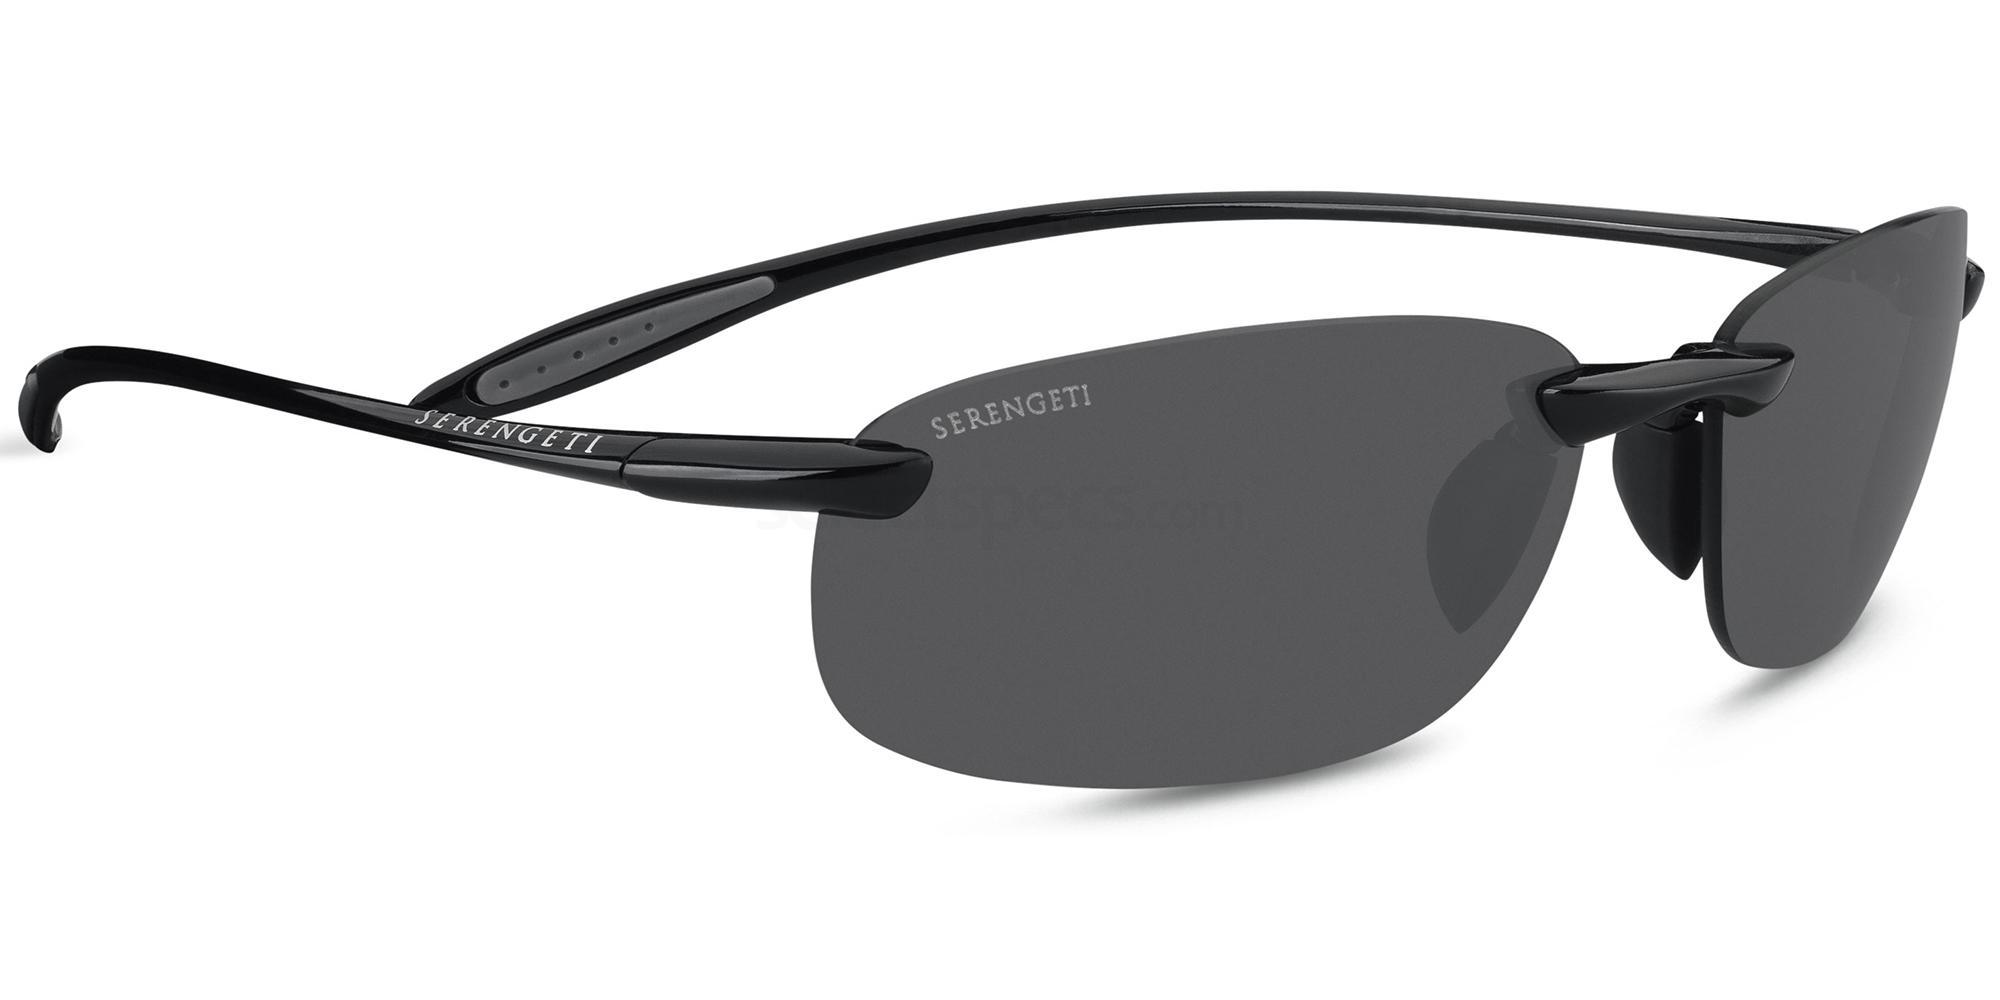 7359 Serengeti Sport NUVOLA Sunglasses, Serengeti